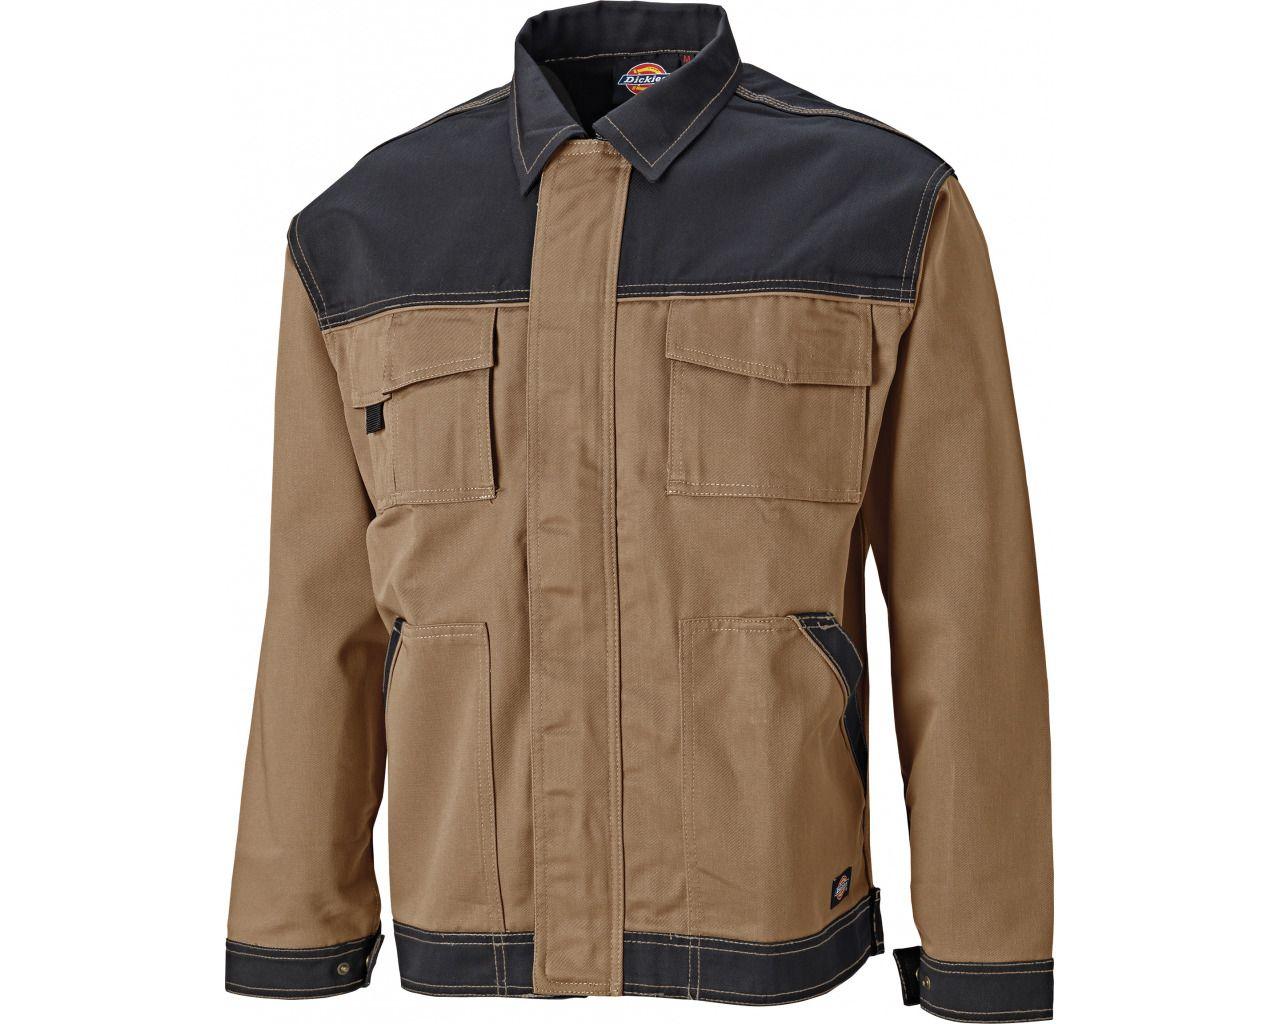 Industry300 Two Tone Work Jacket -  Khaki